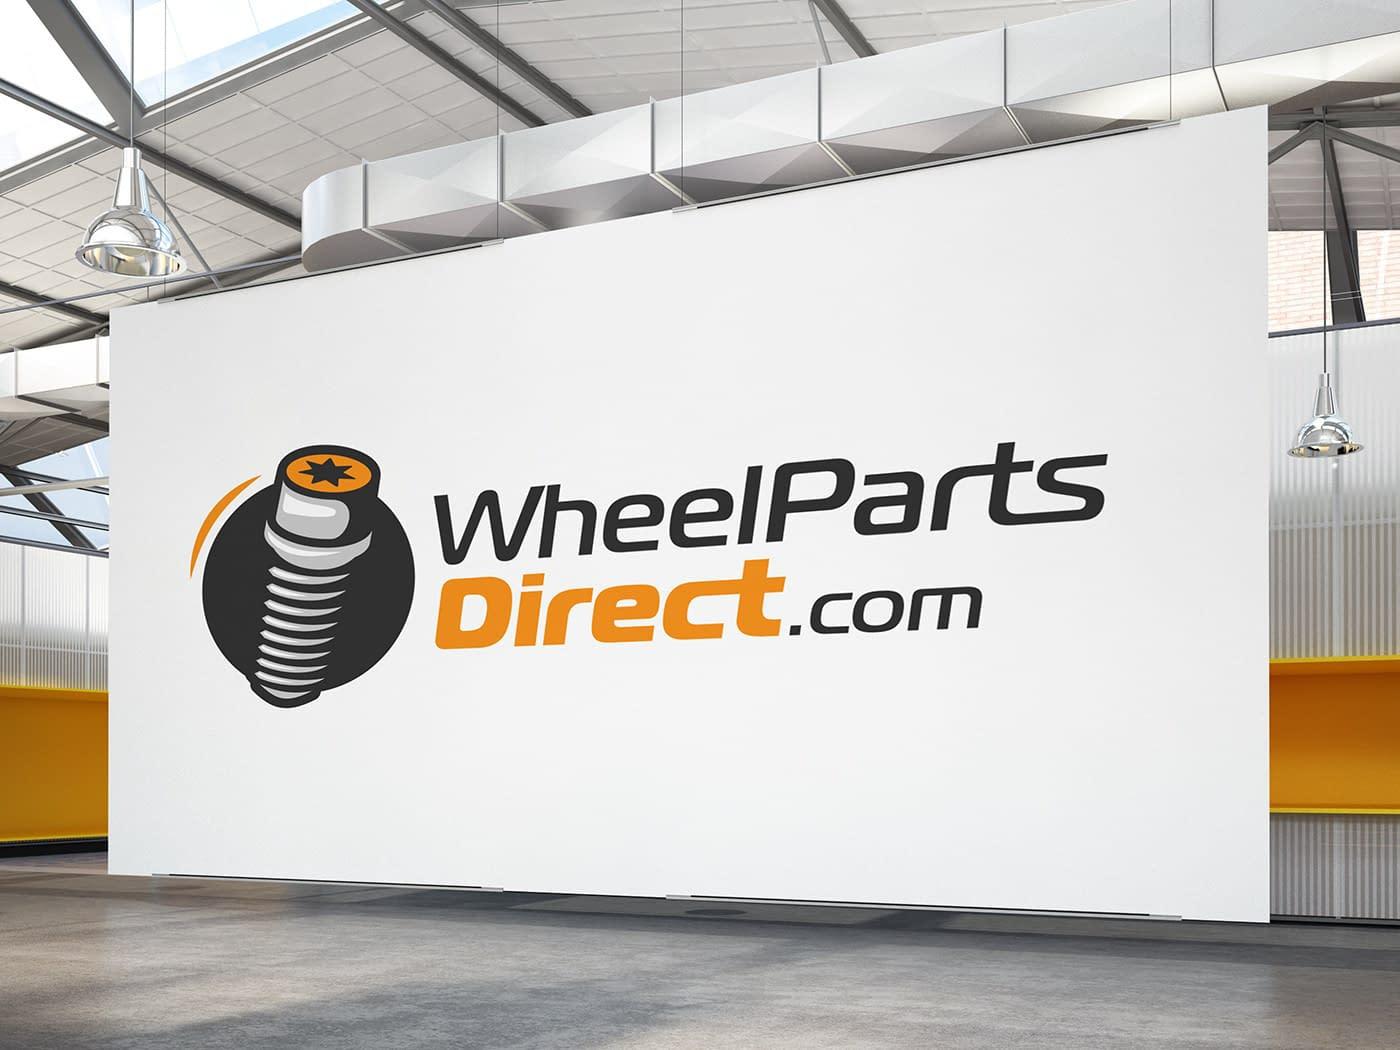 eximdesign_wheelparts_2.jpg